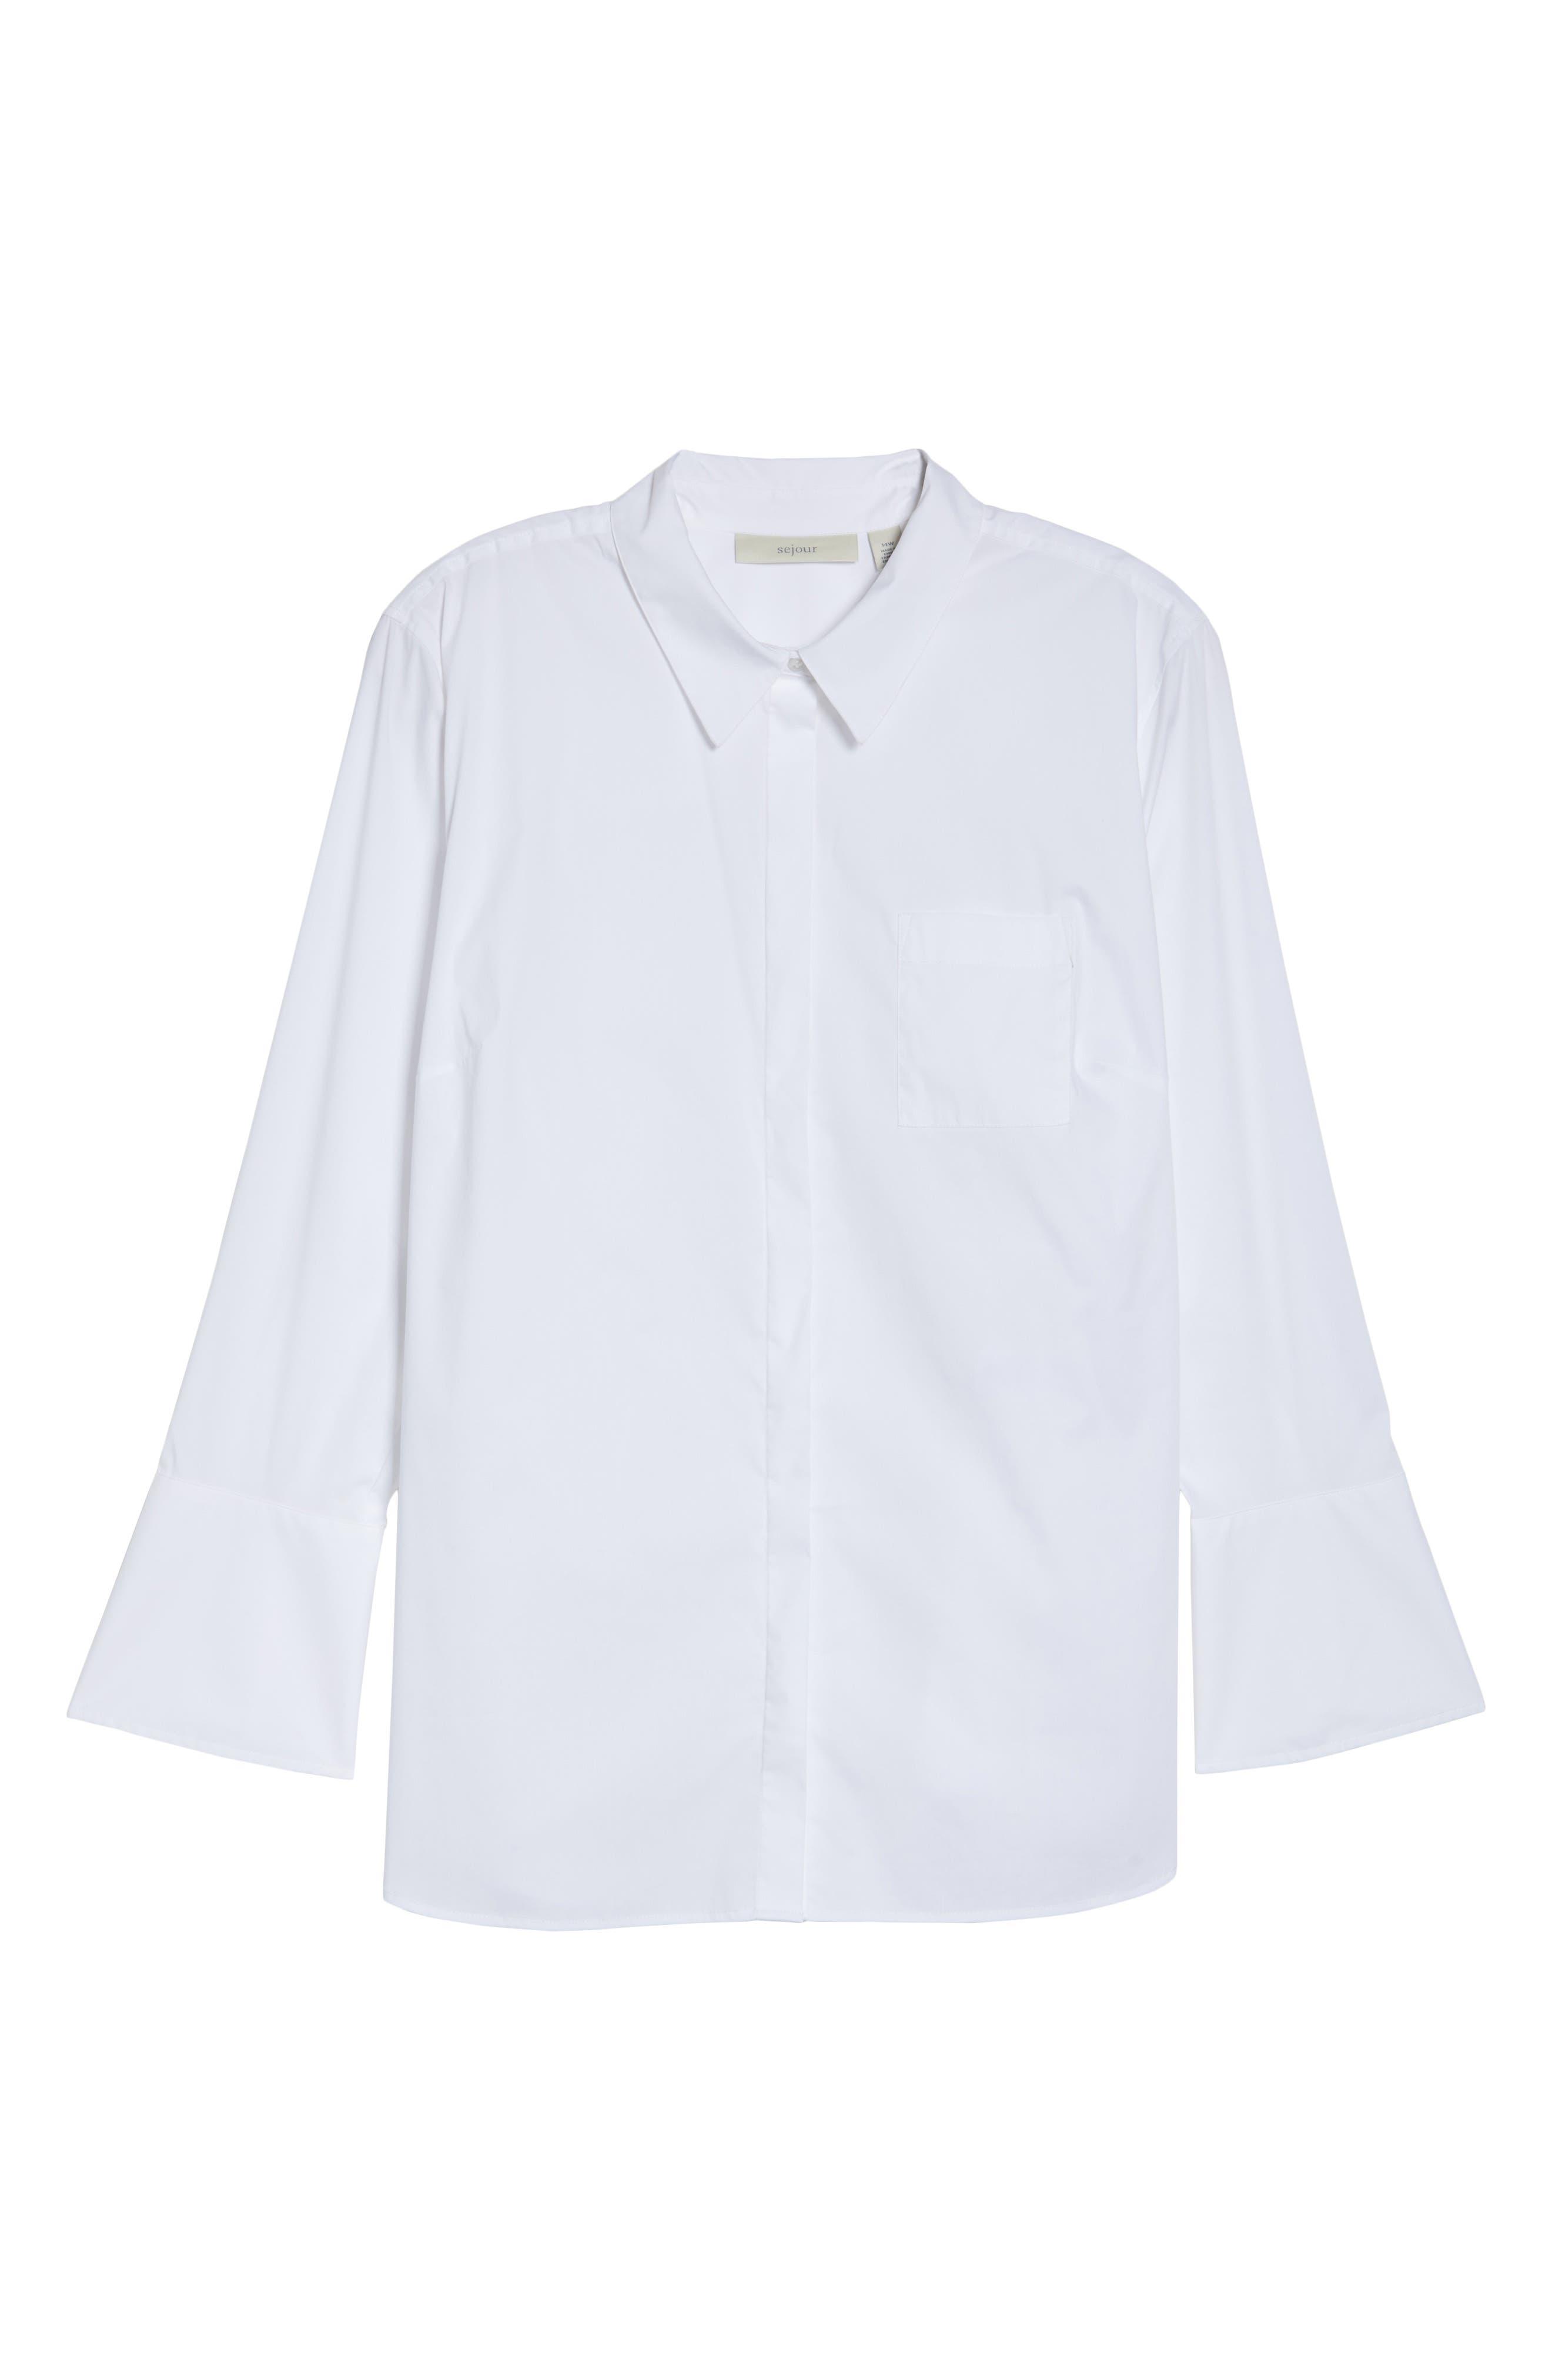 Tunic Button Down Shirt,                             Alternate thumbnail 6, color,                             White